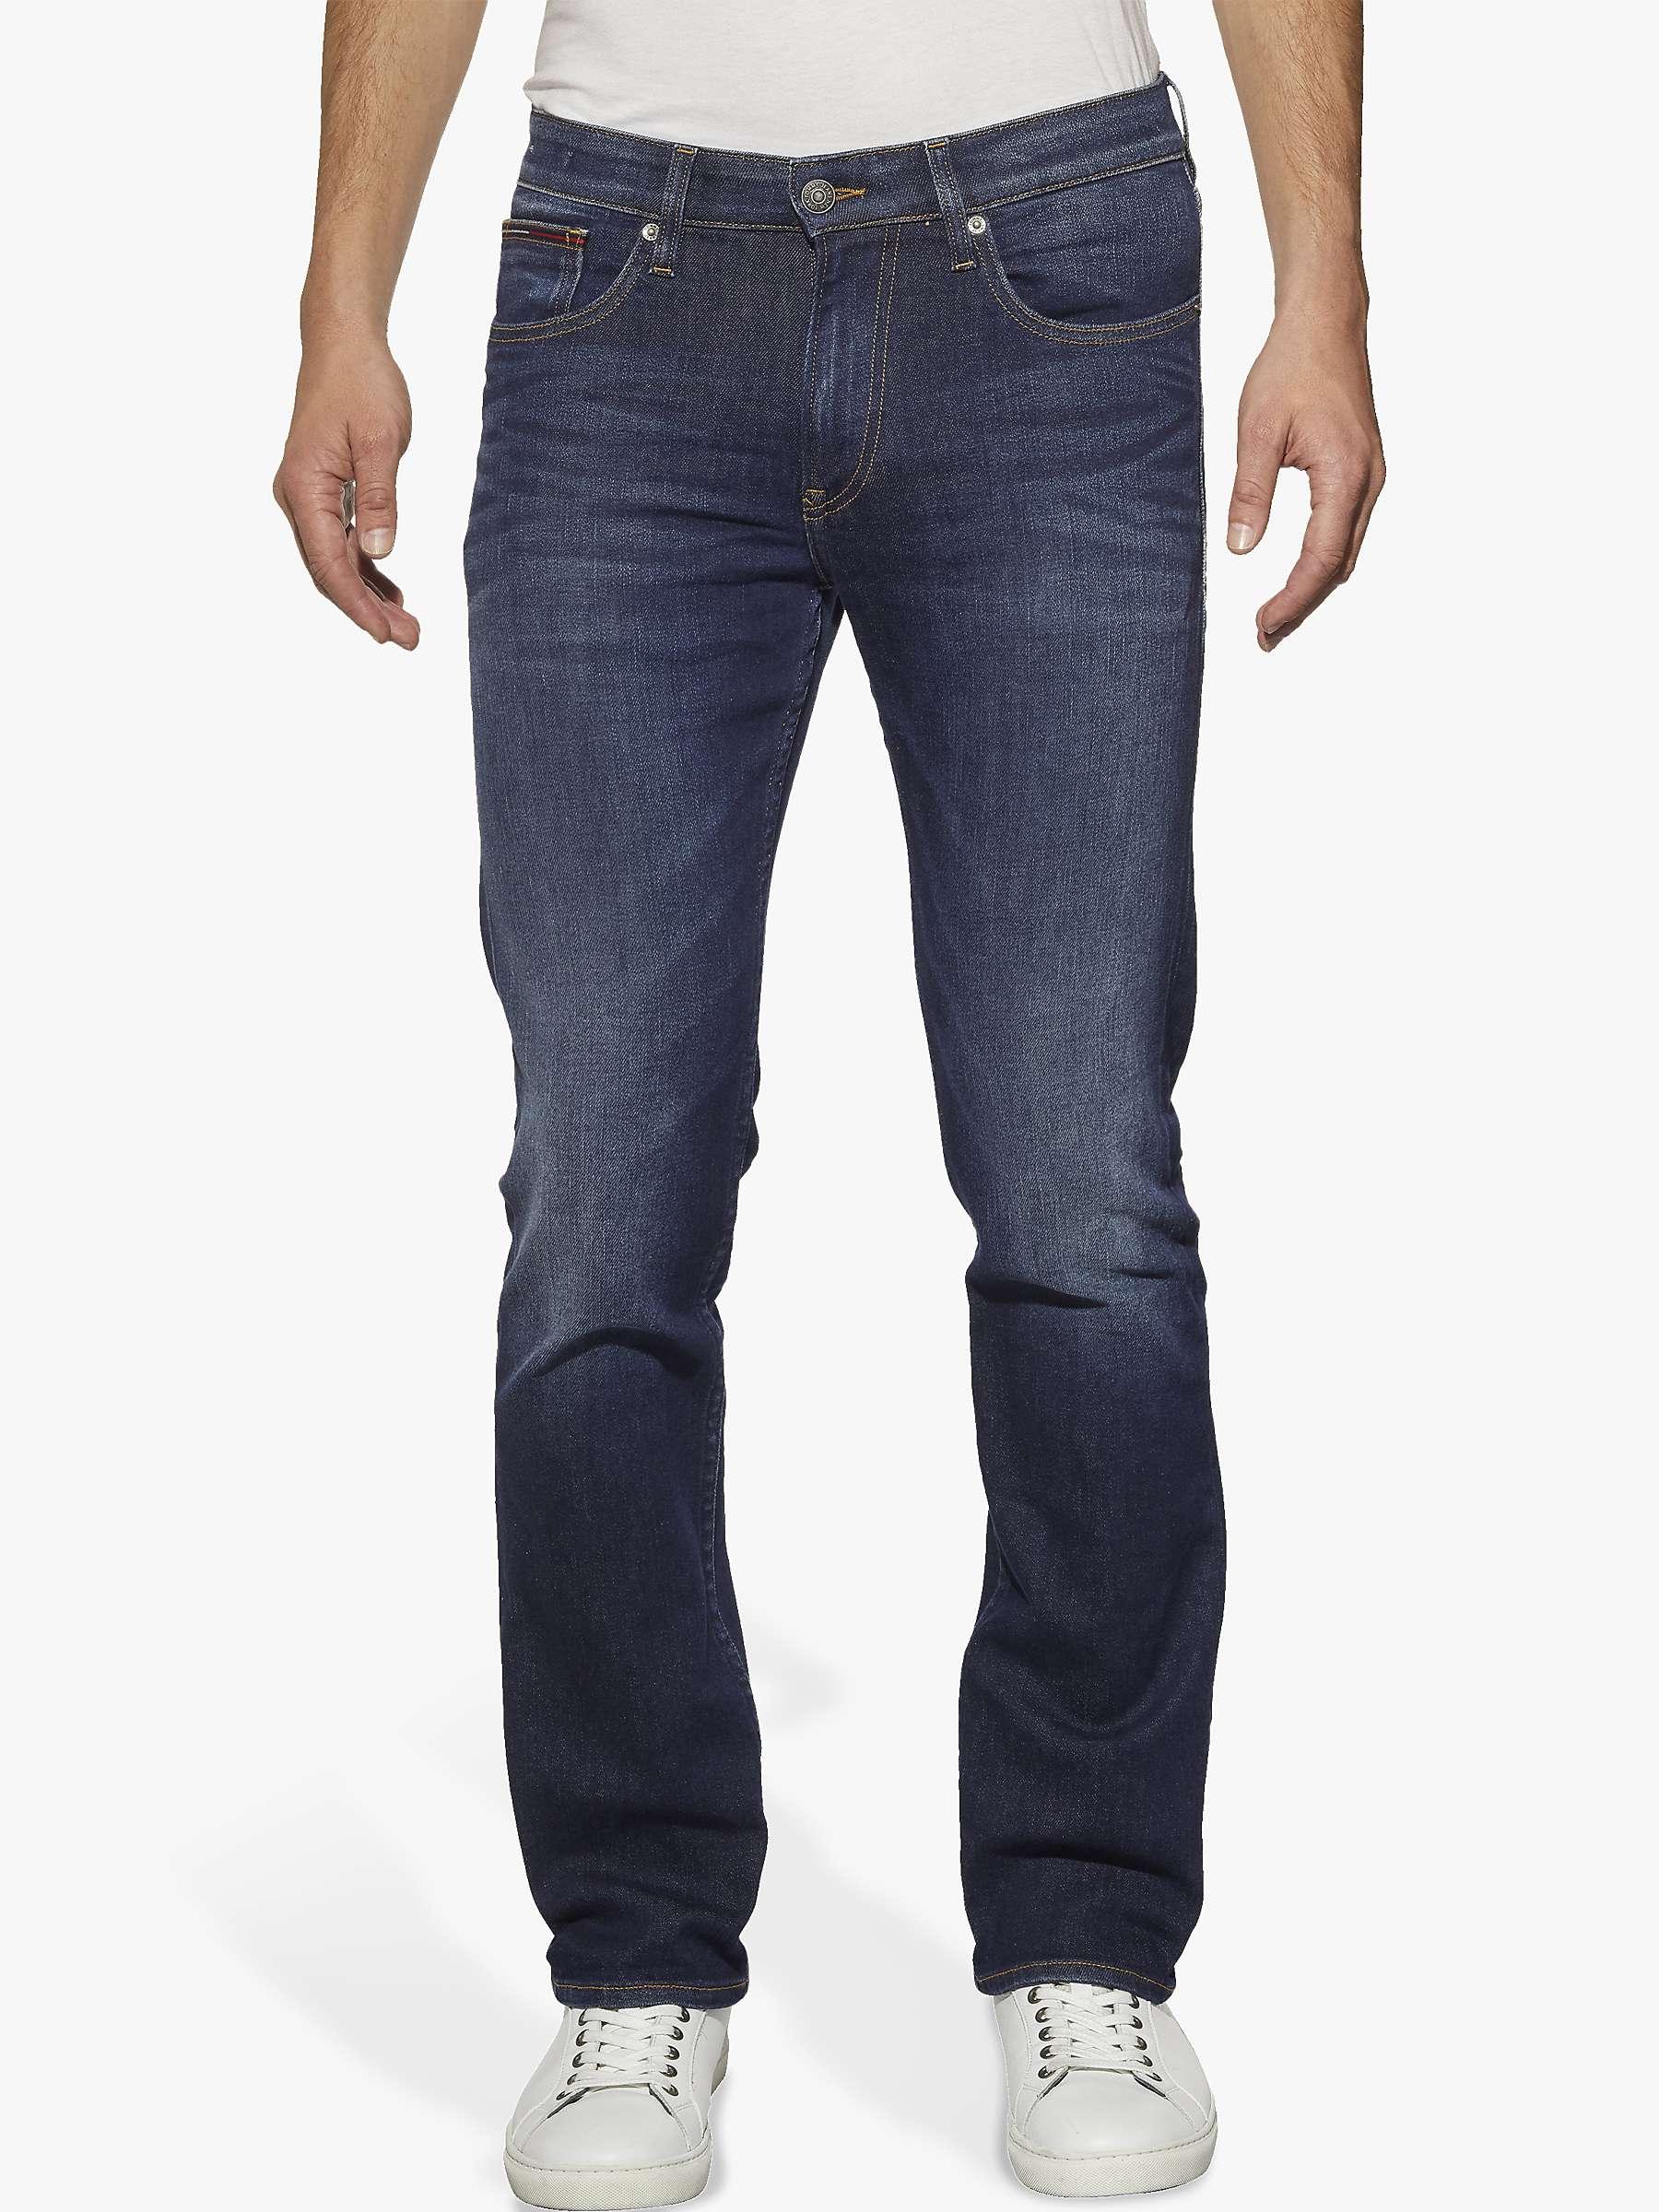 Tommy Hilfiger Ryan Original Straight Jean Venue Menswear